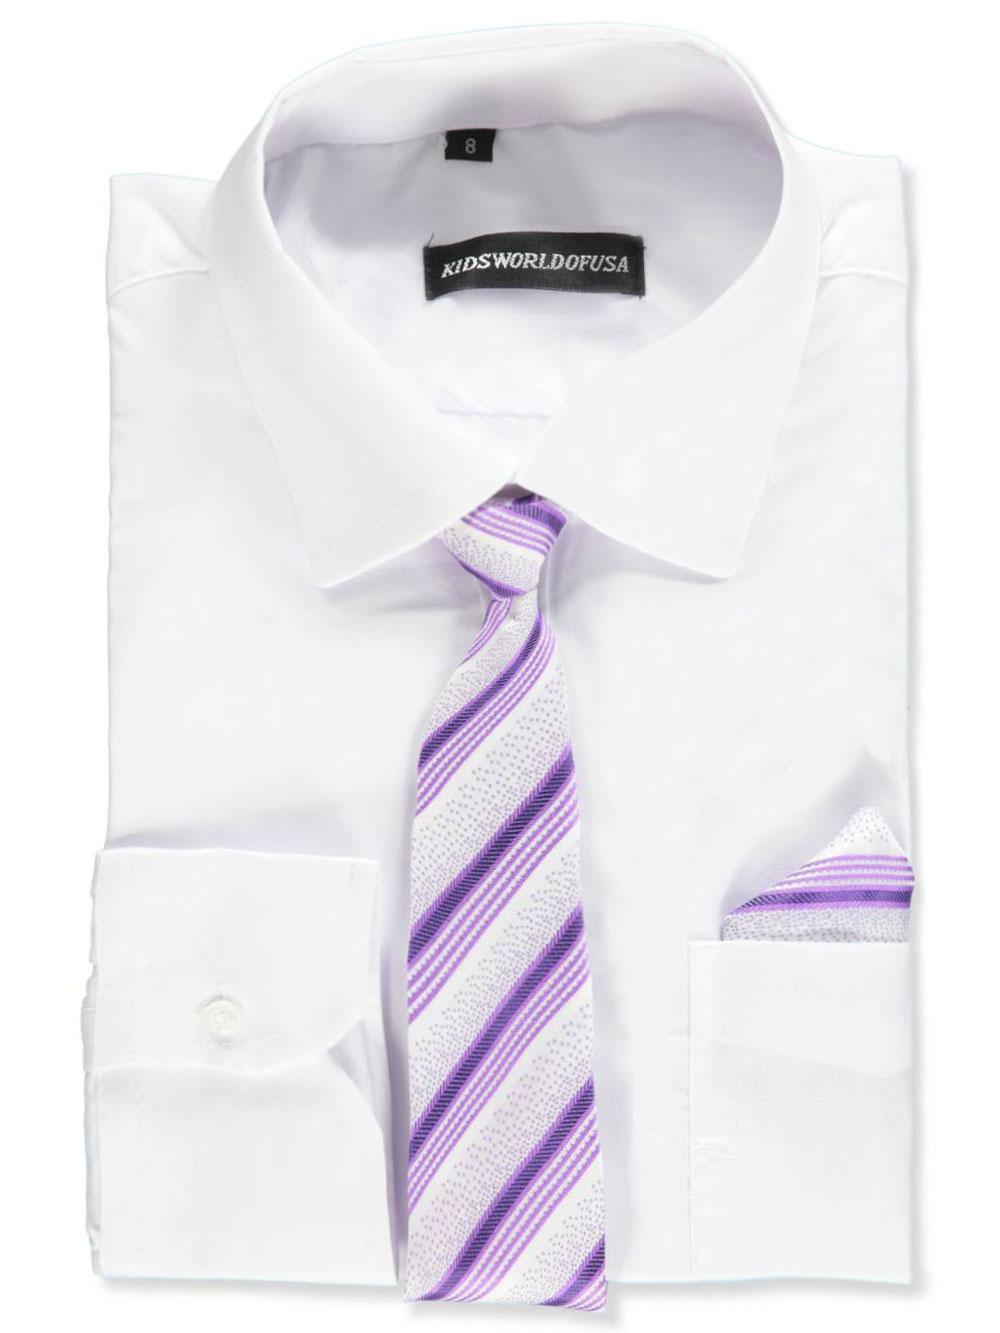 Kids World Boys Dress Shirt With Accessories Ebay